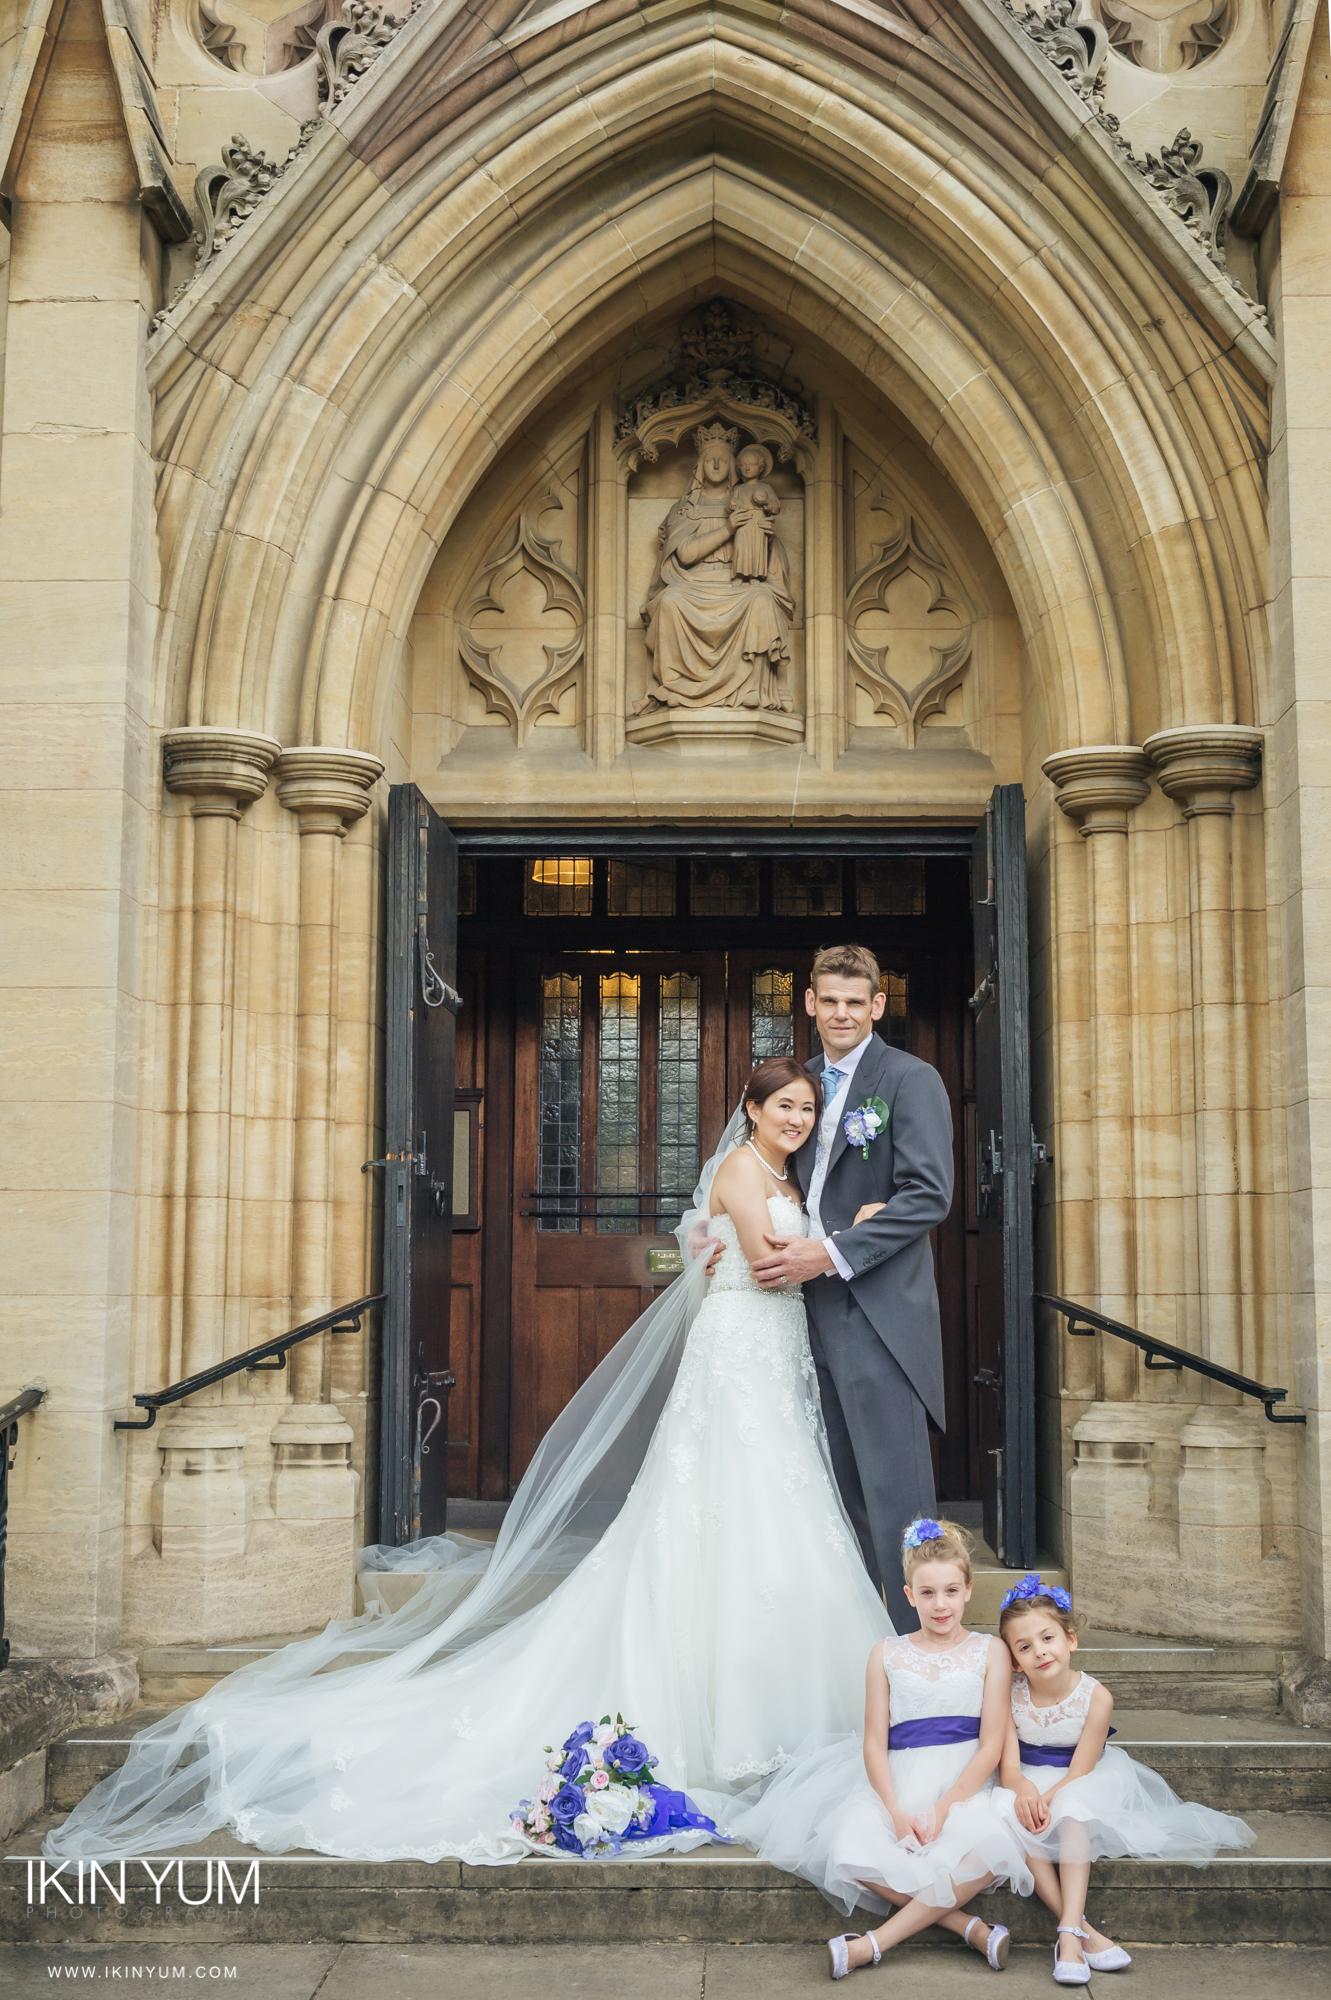 Teresa & Johnathan Weddong Day - Couple Photoshoot-0011.jpg